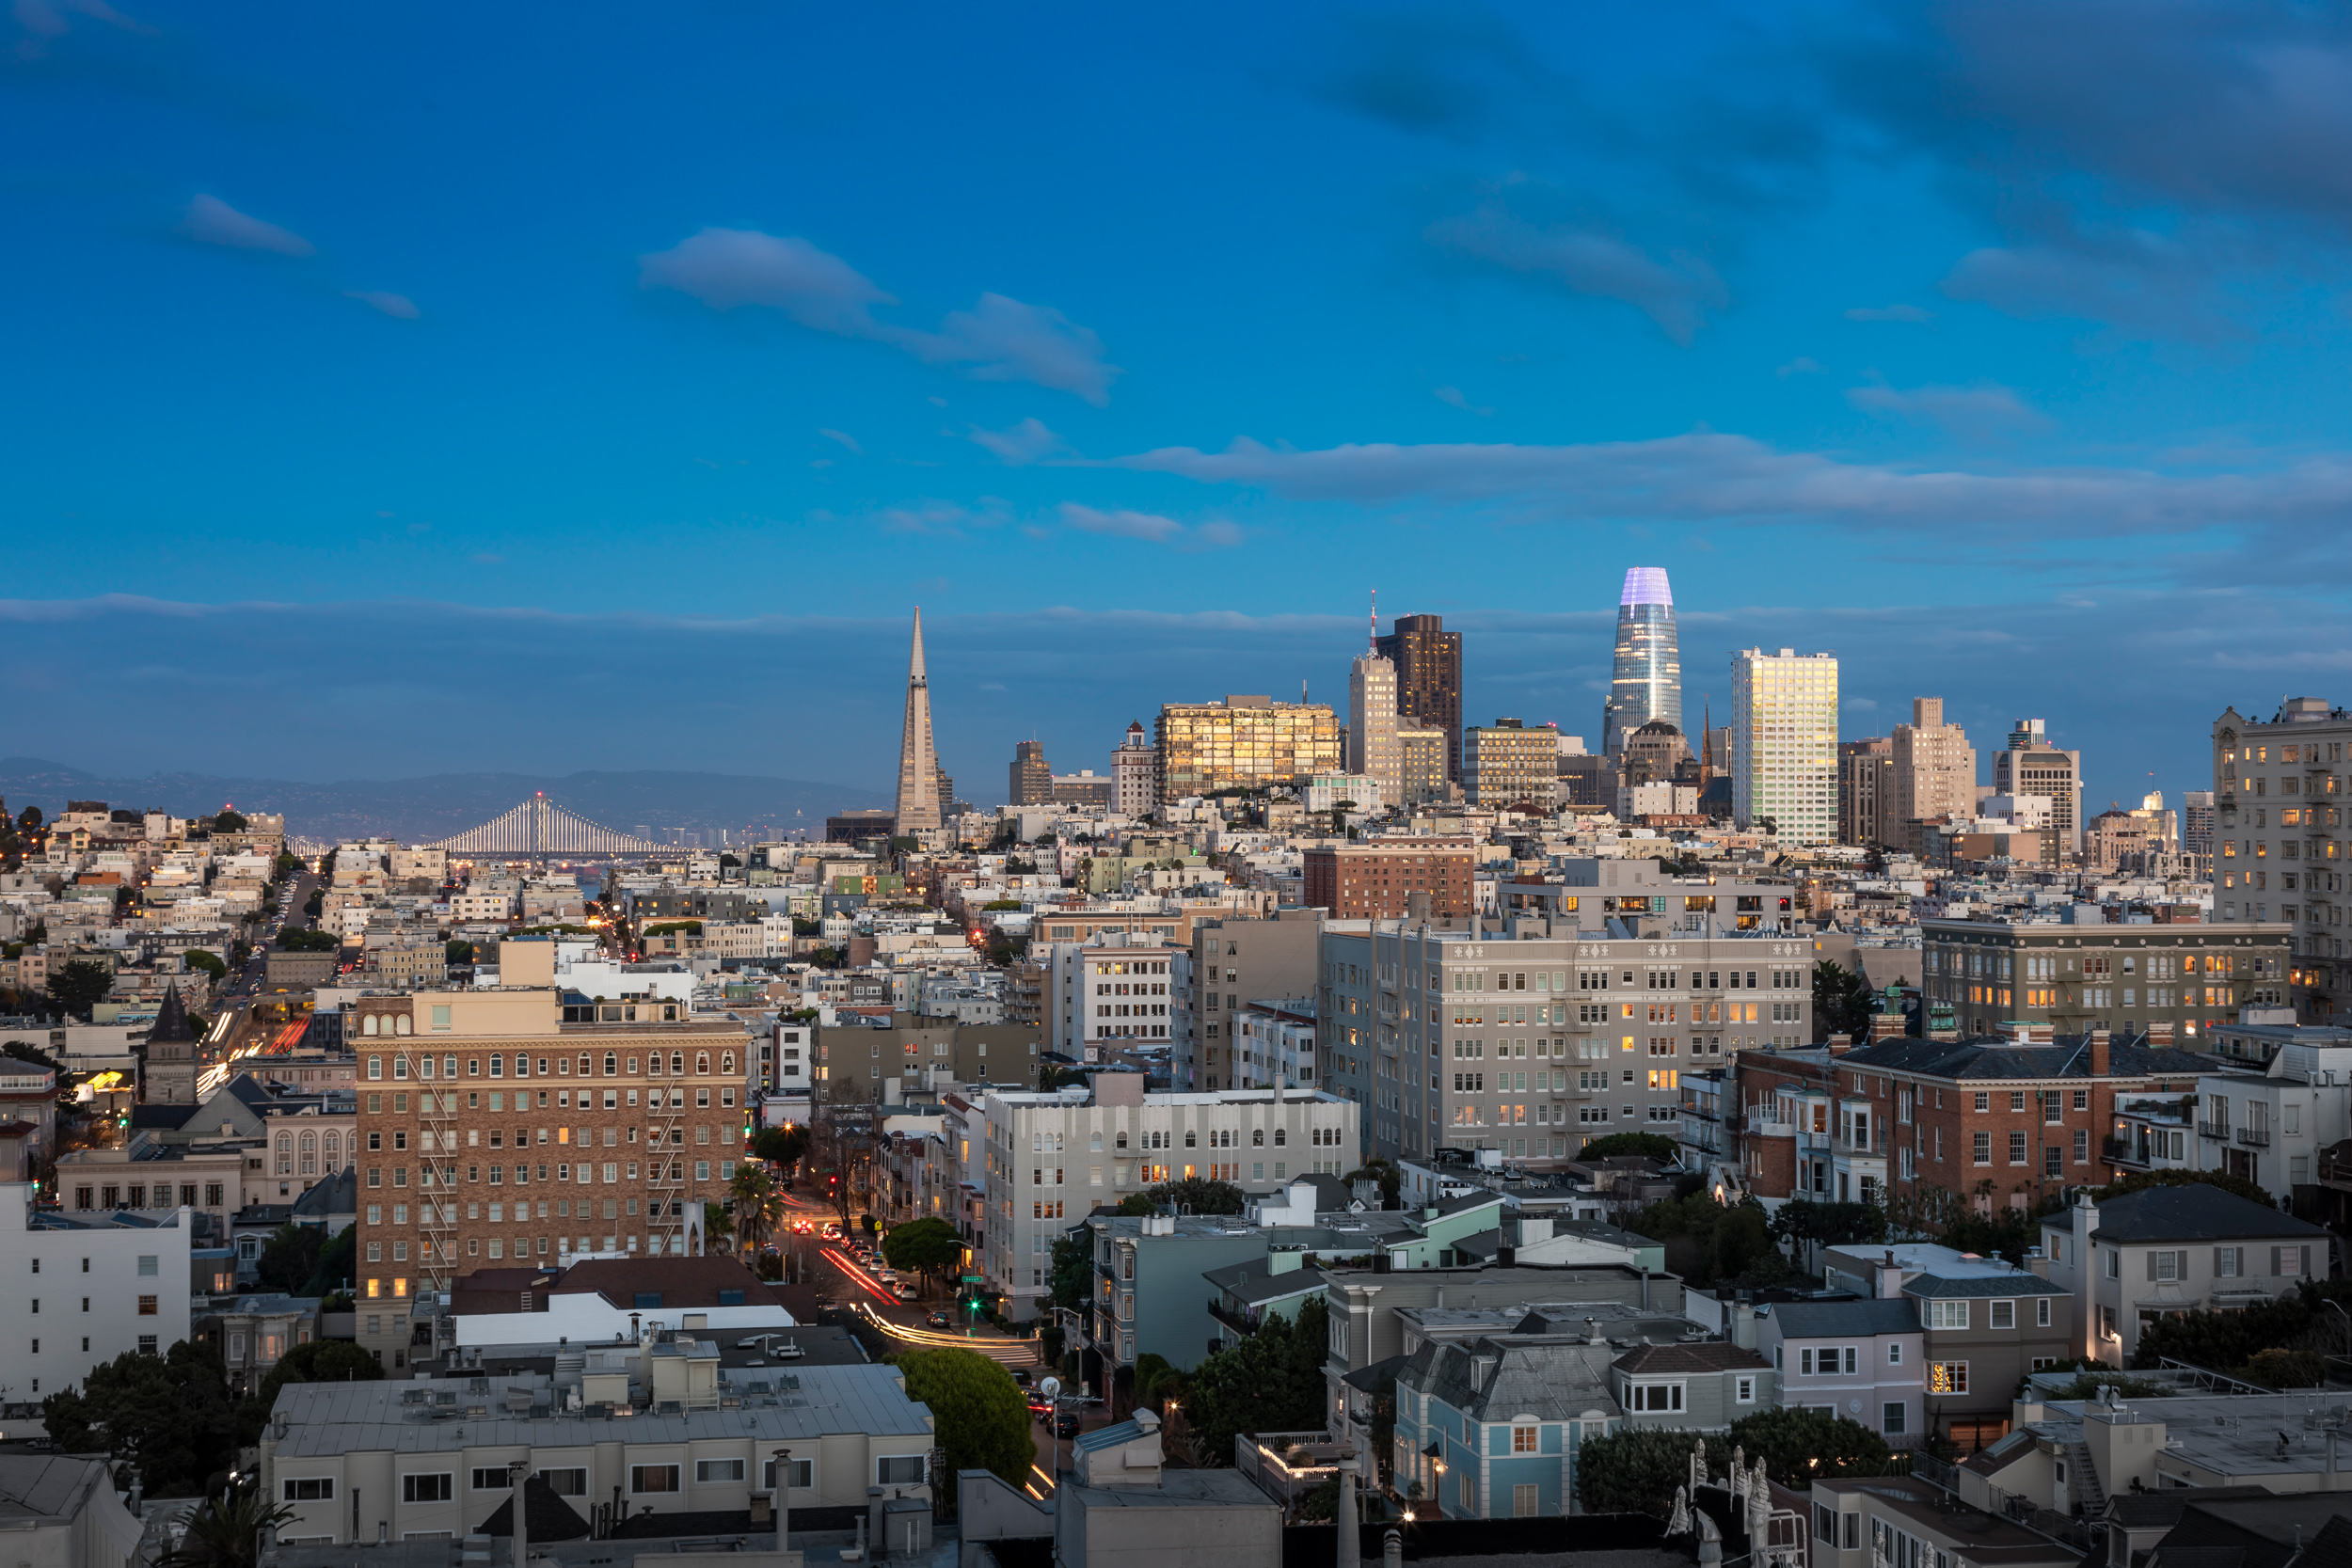 View_Downtown_9223.jpg